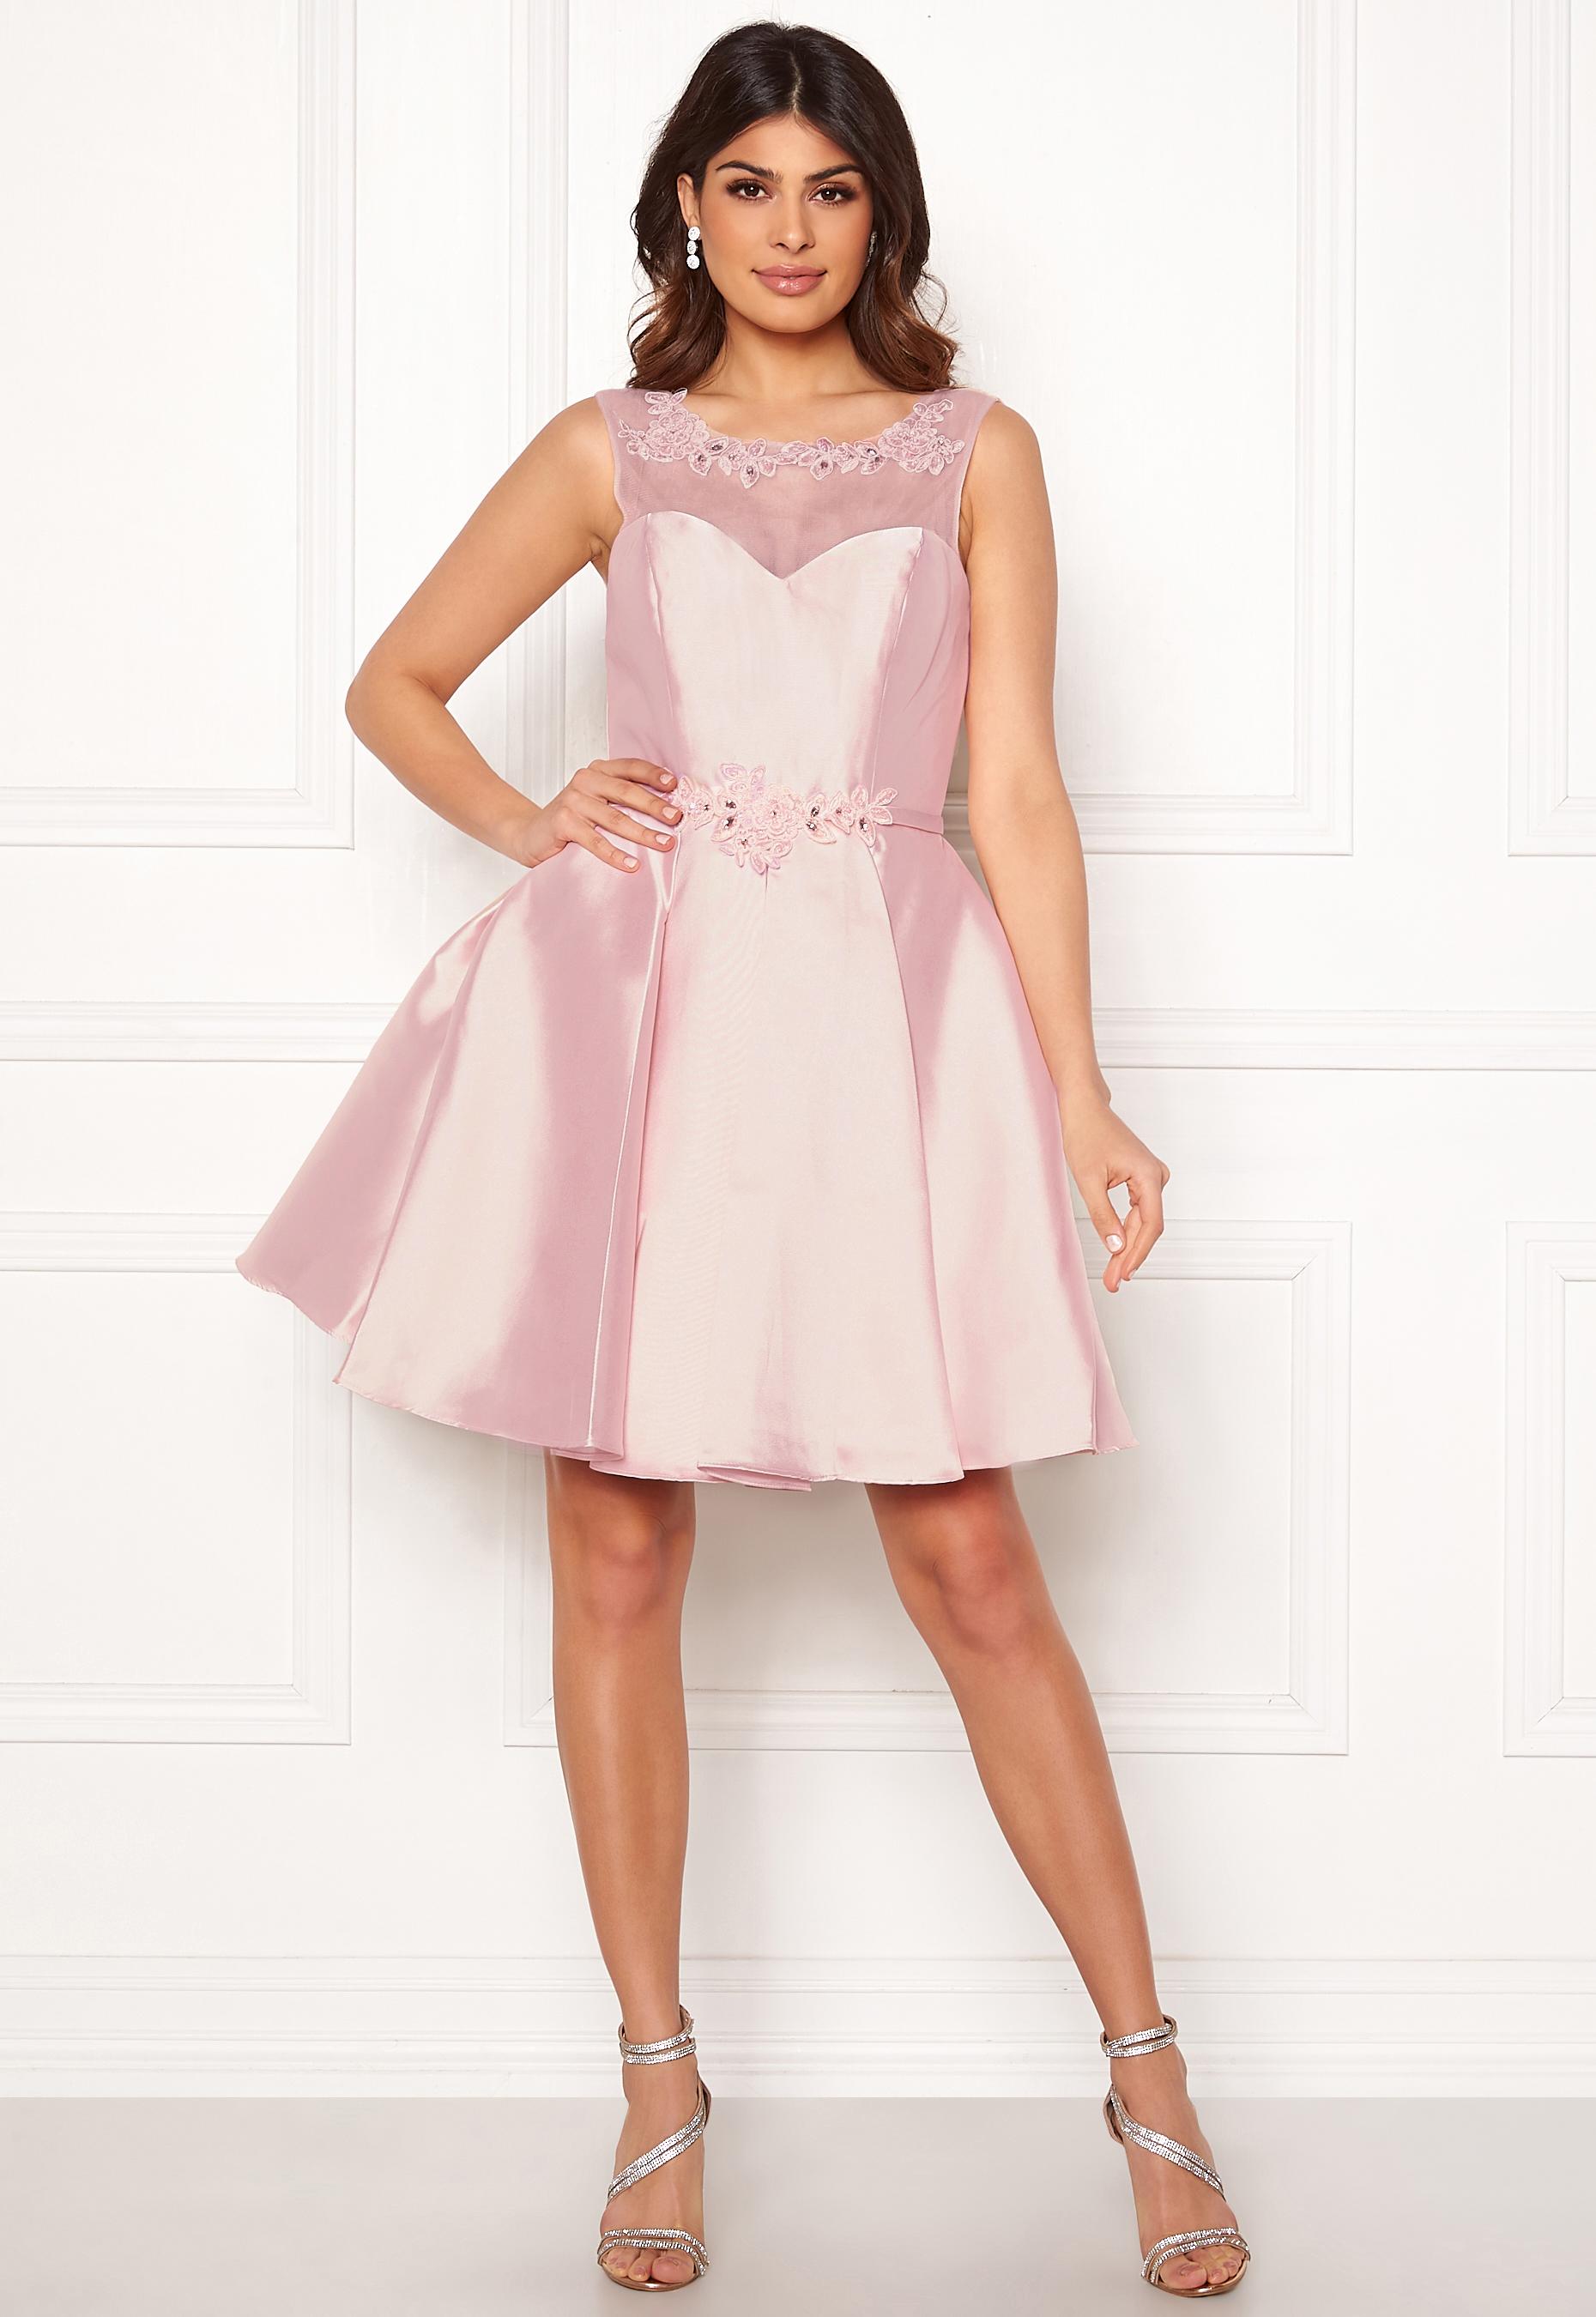 33eae8c27542f SUSANNA RIVIERI Embroidered Dream Dress Blush - Bubbleroom